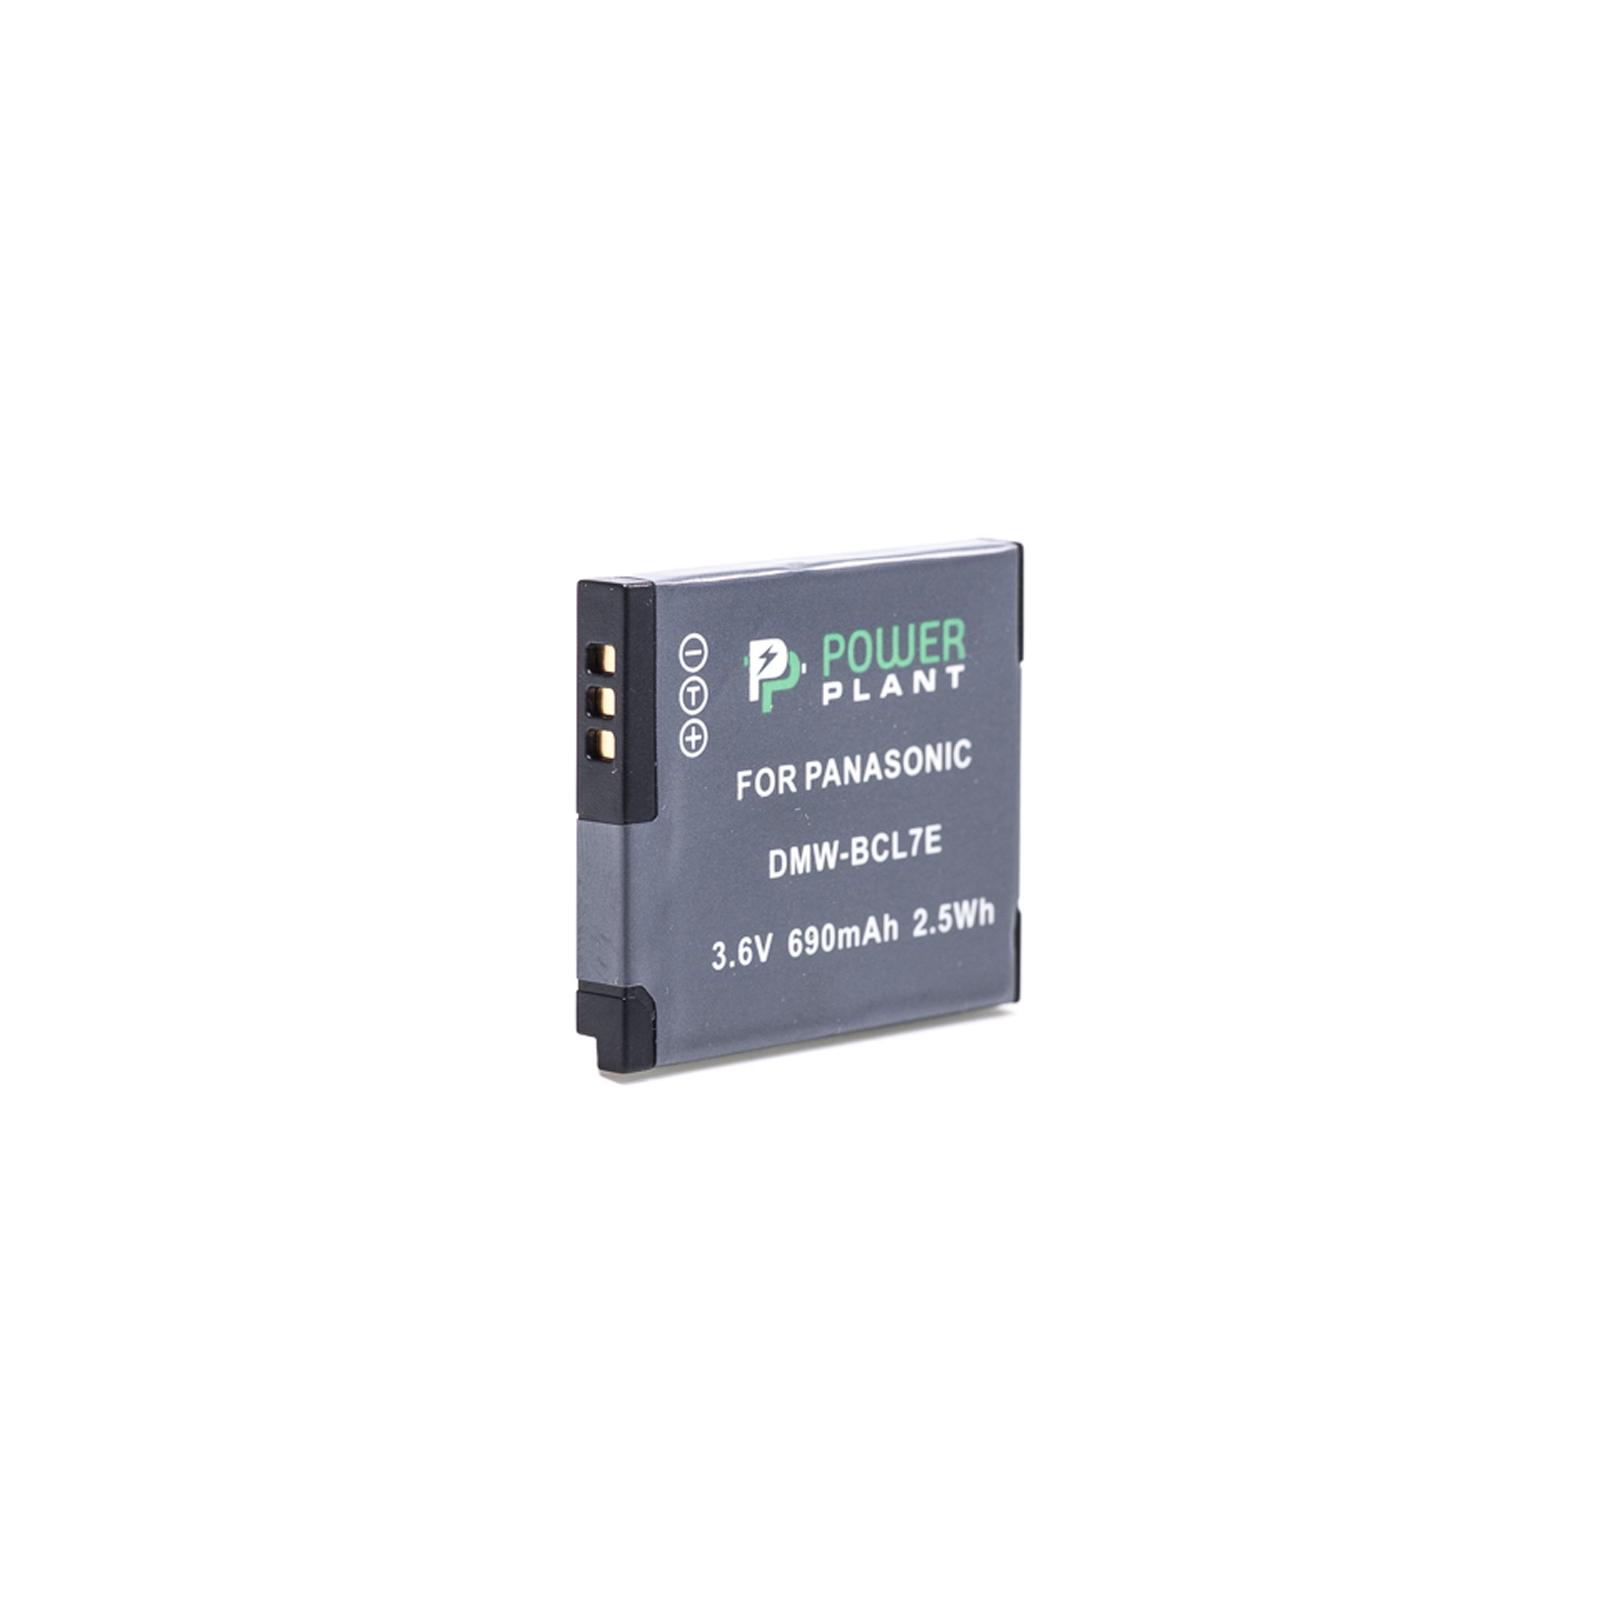 Аккумулятор к фото/видео PowerPlant Panasonic DMW-BCL7E (DV00DV1380) изображение 2